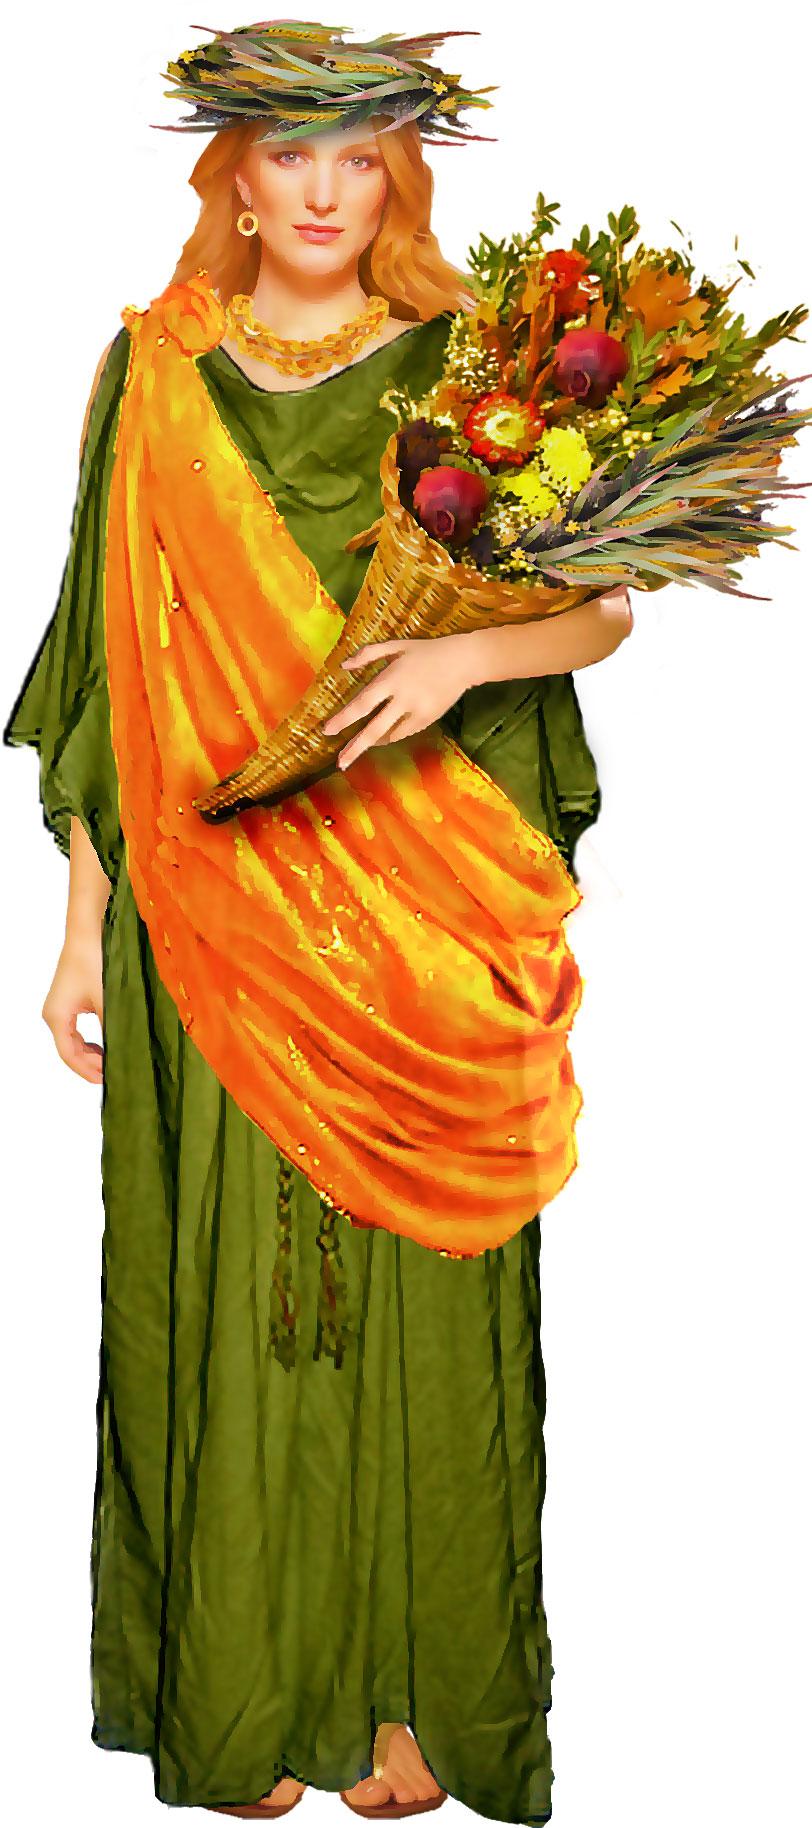 Cornucopia clipart demeter Demeter bouquet bouquet Green Costume